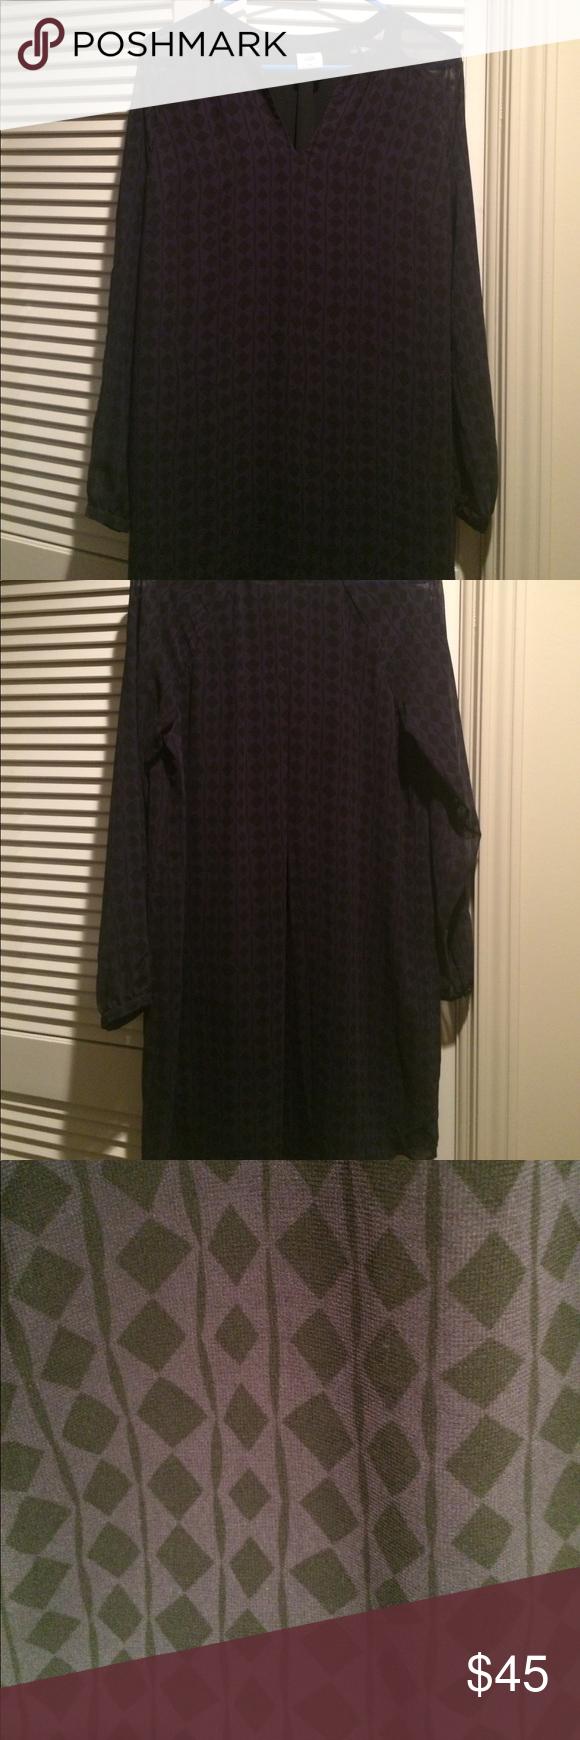 Cabi dress purple with black diamond print long sleeved cabi dress